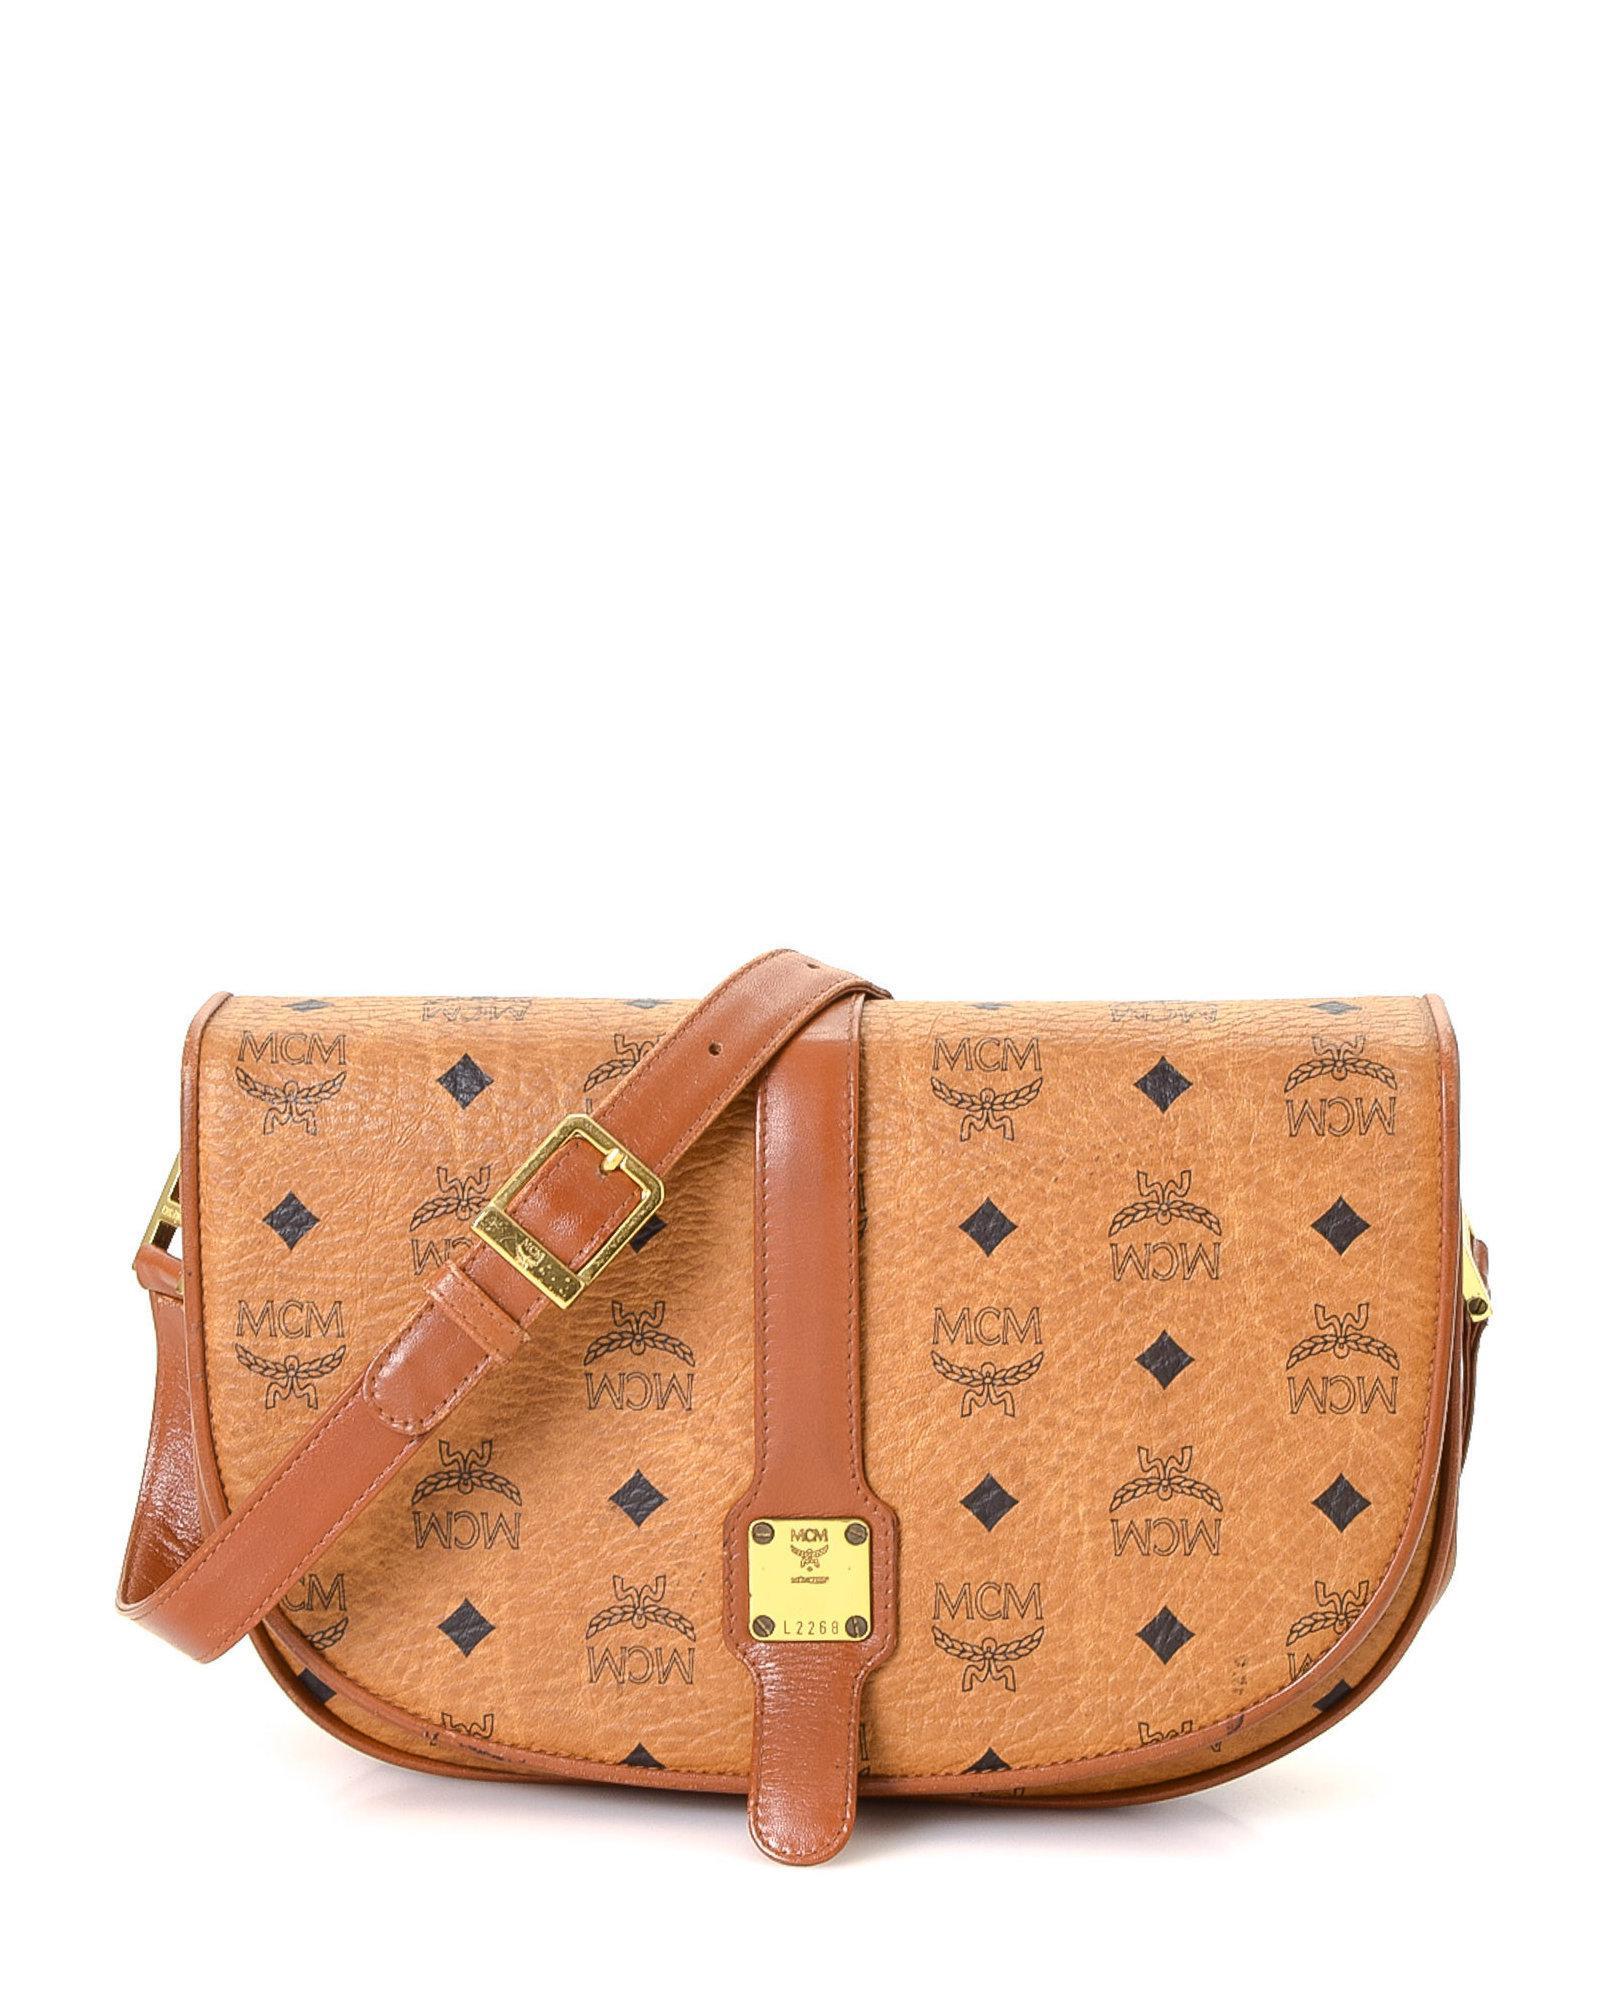 7fb962a05 MCM Visetos Shoulder Bag - Vintage in Brown - Lyst